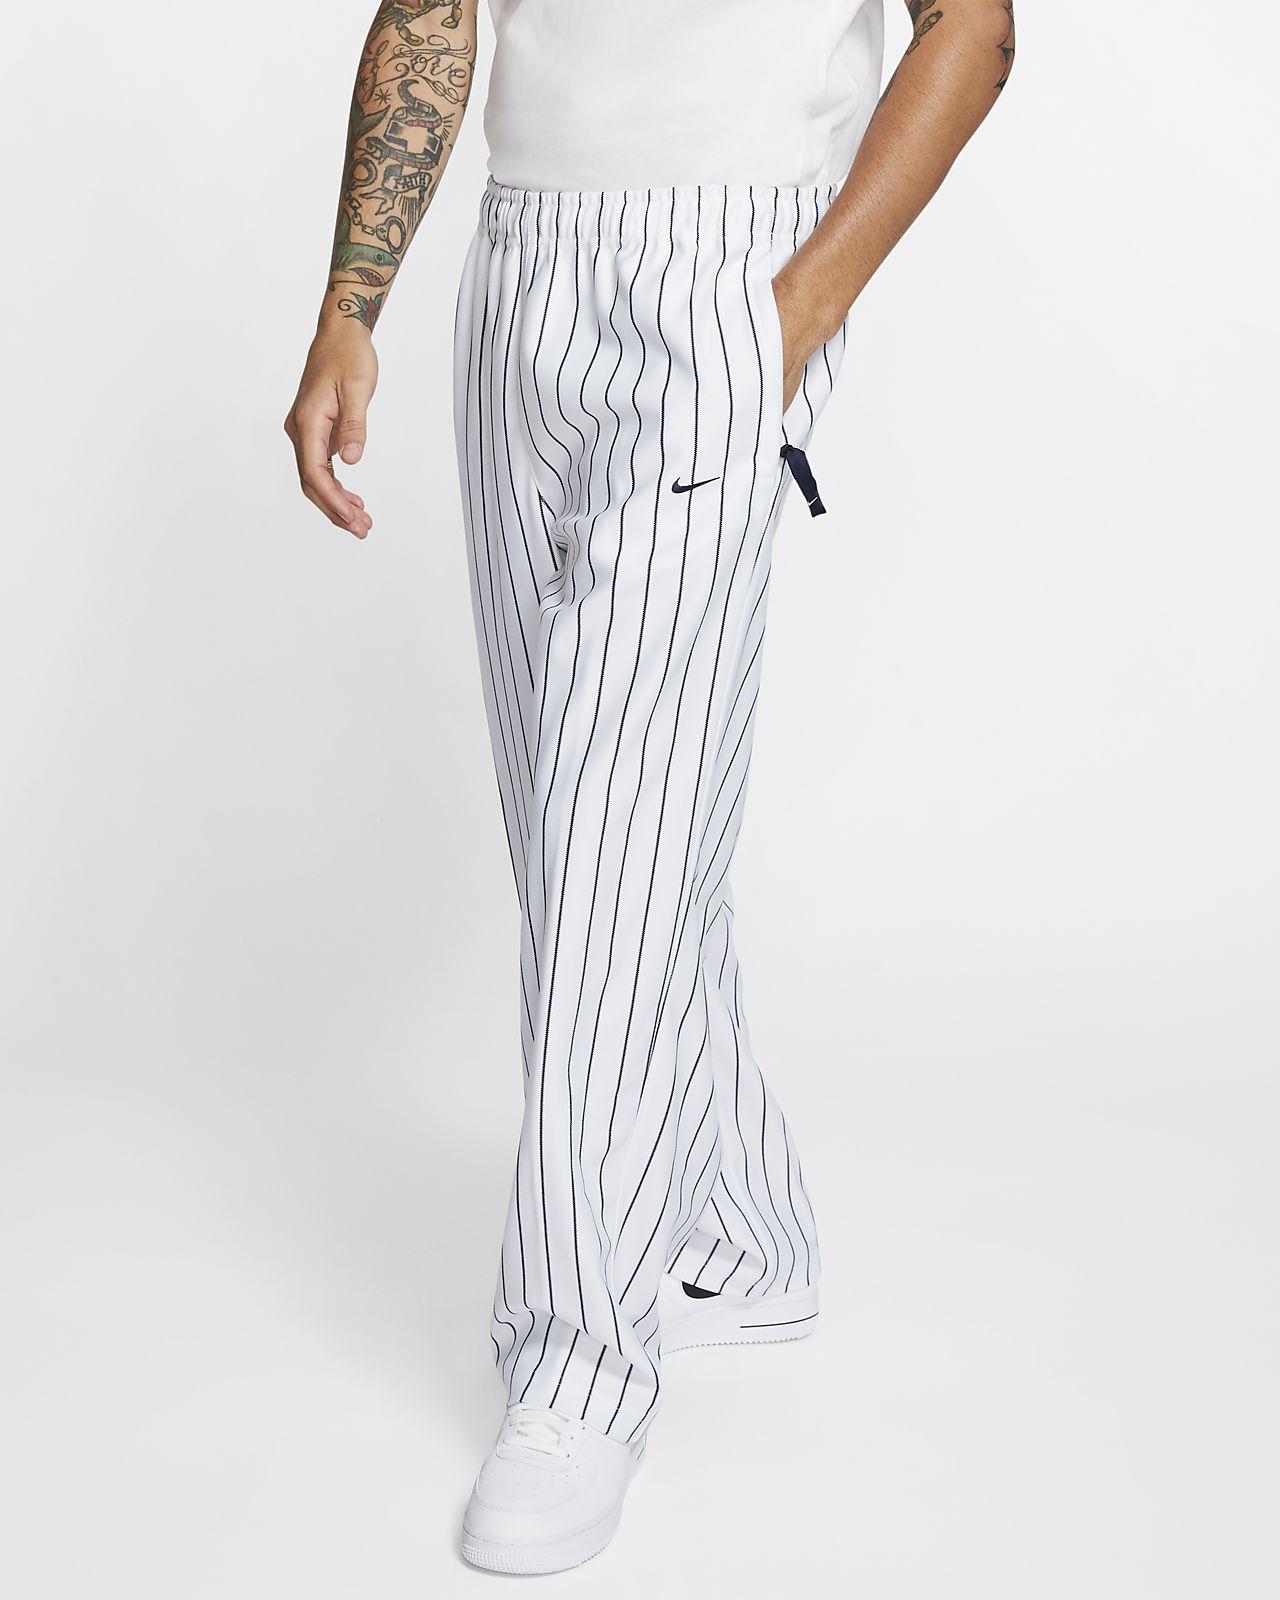 Nike Men's Swoosh Striped Trousers